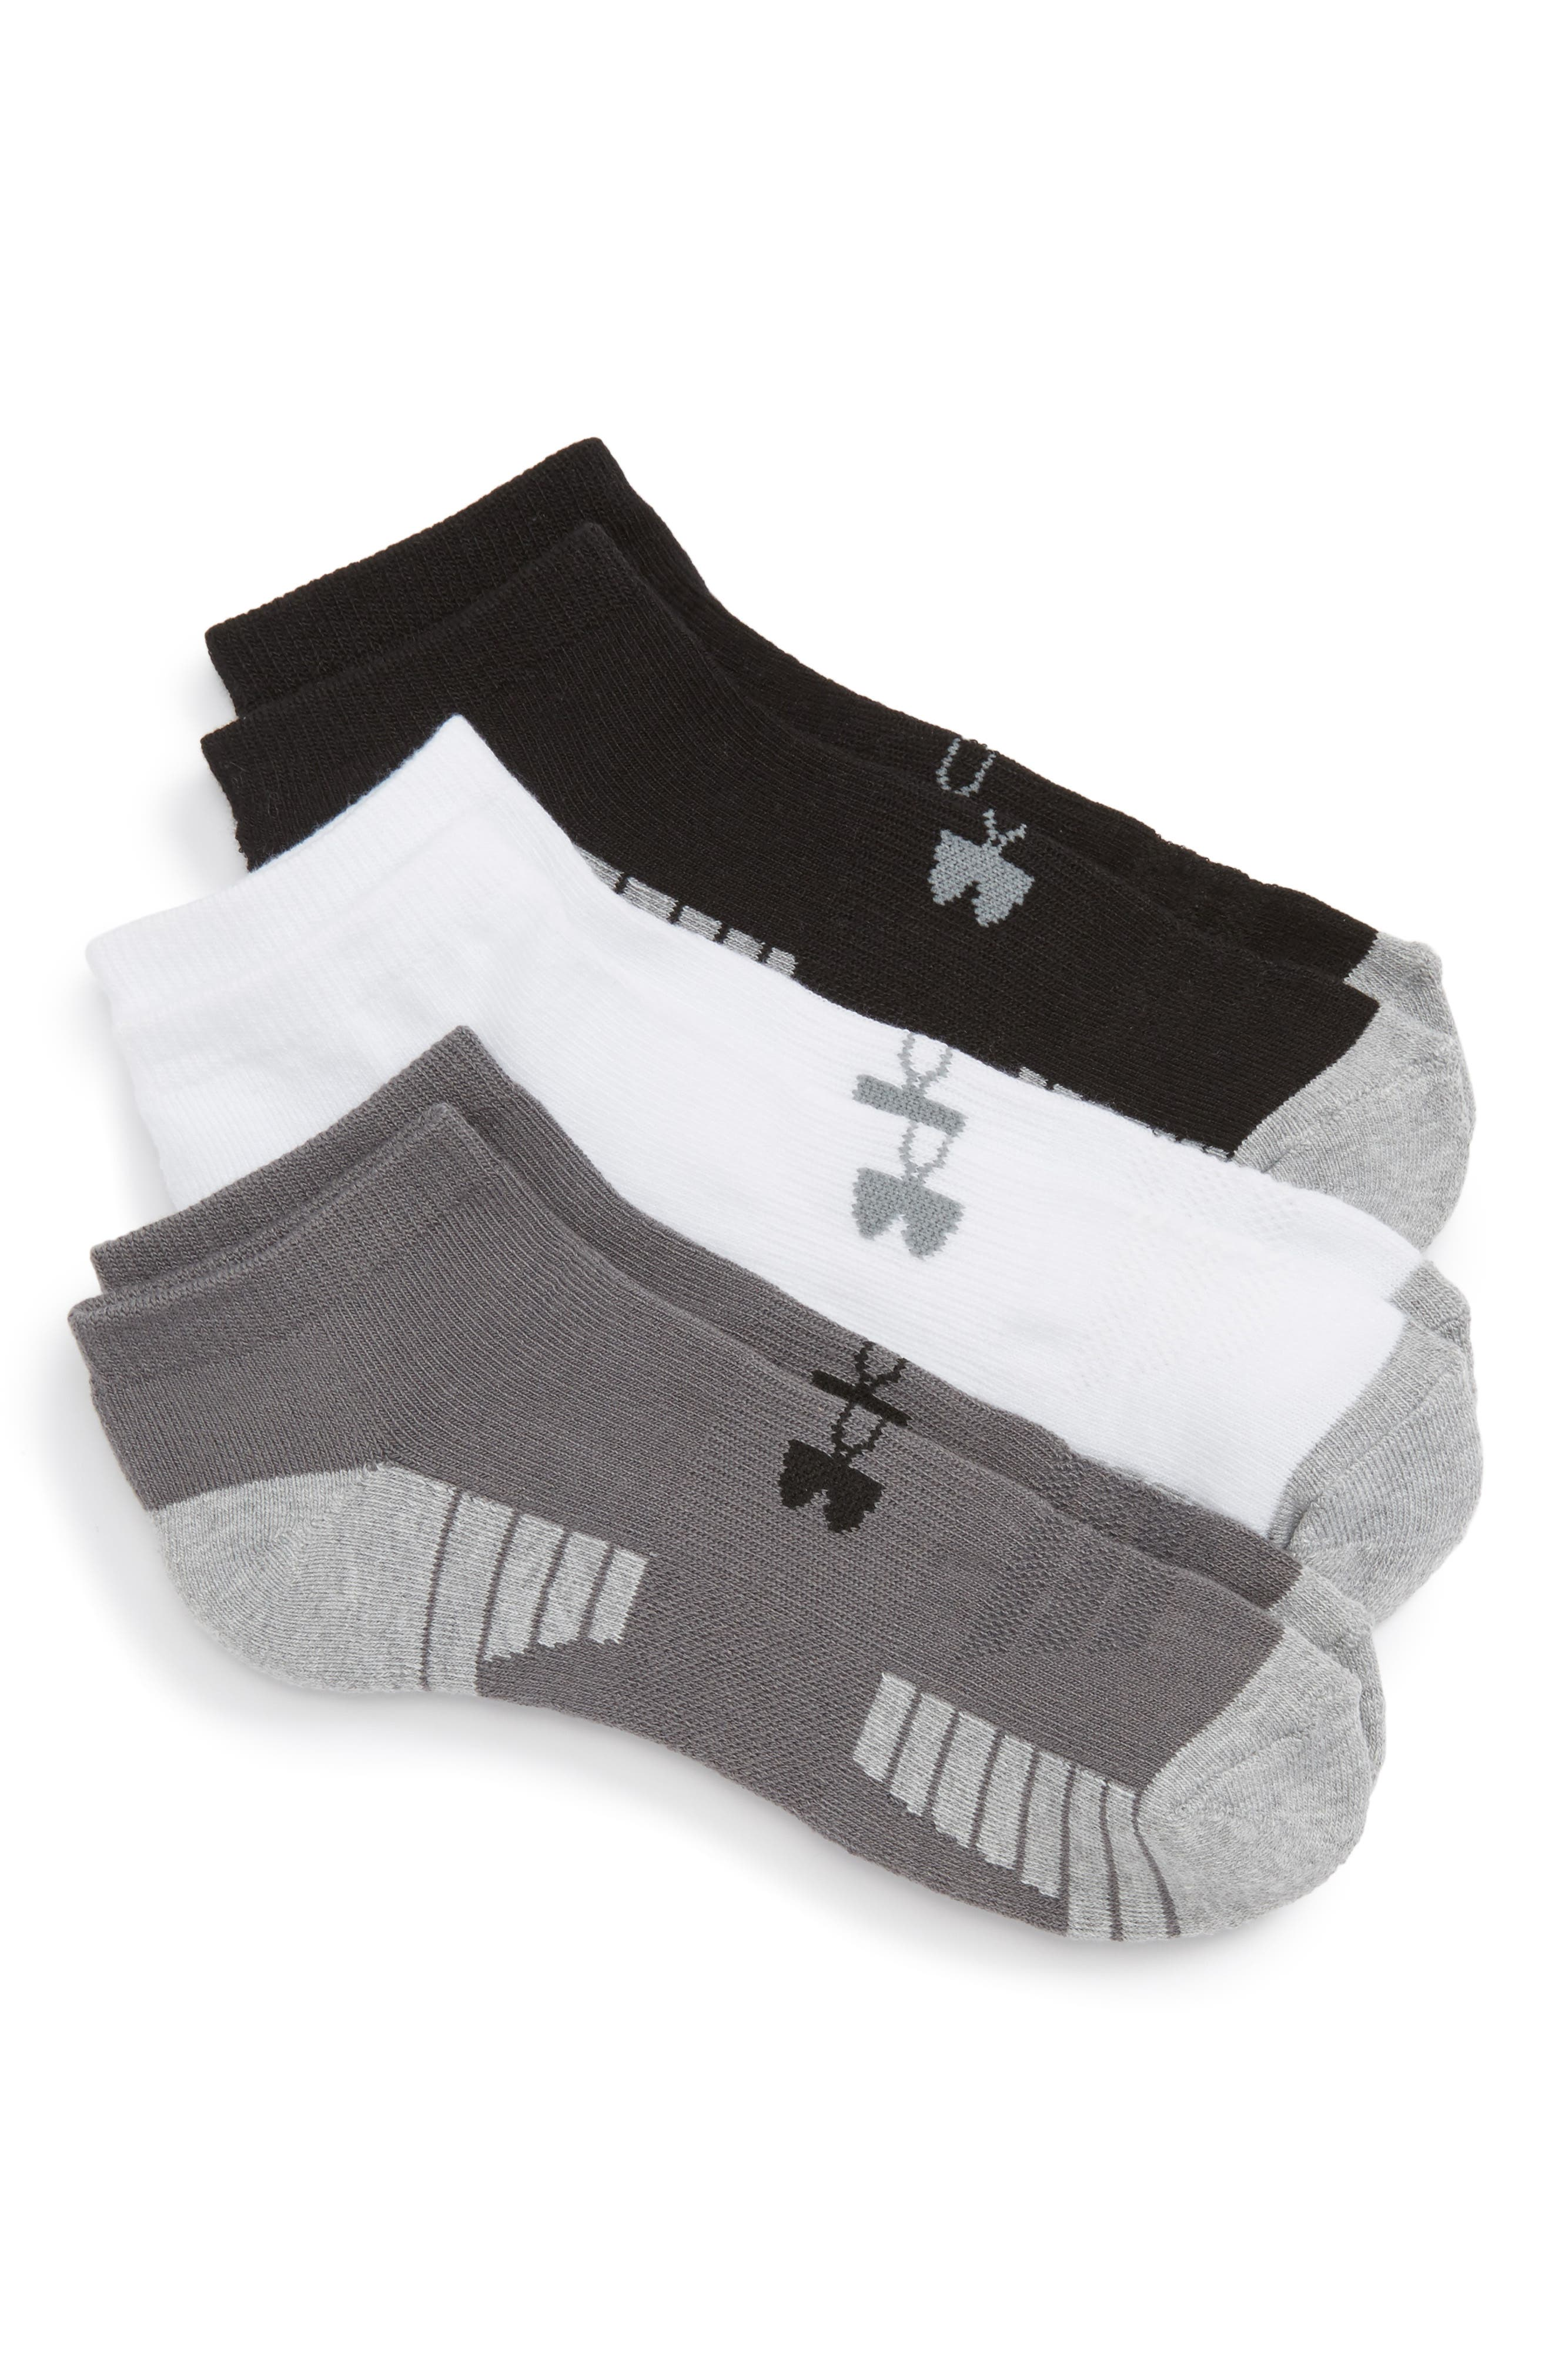 Under Armour HeatGear 3-Pack No-Show Socks